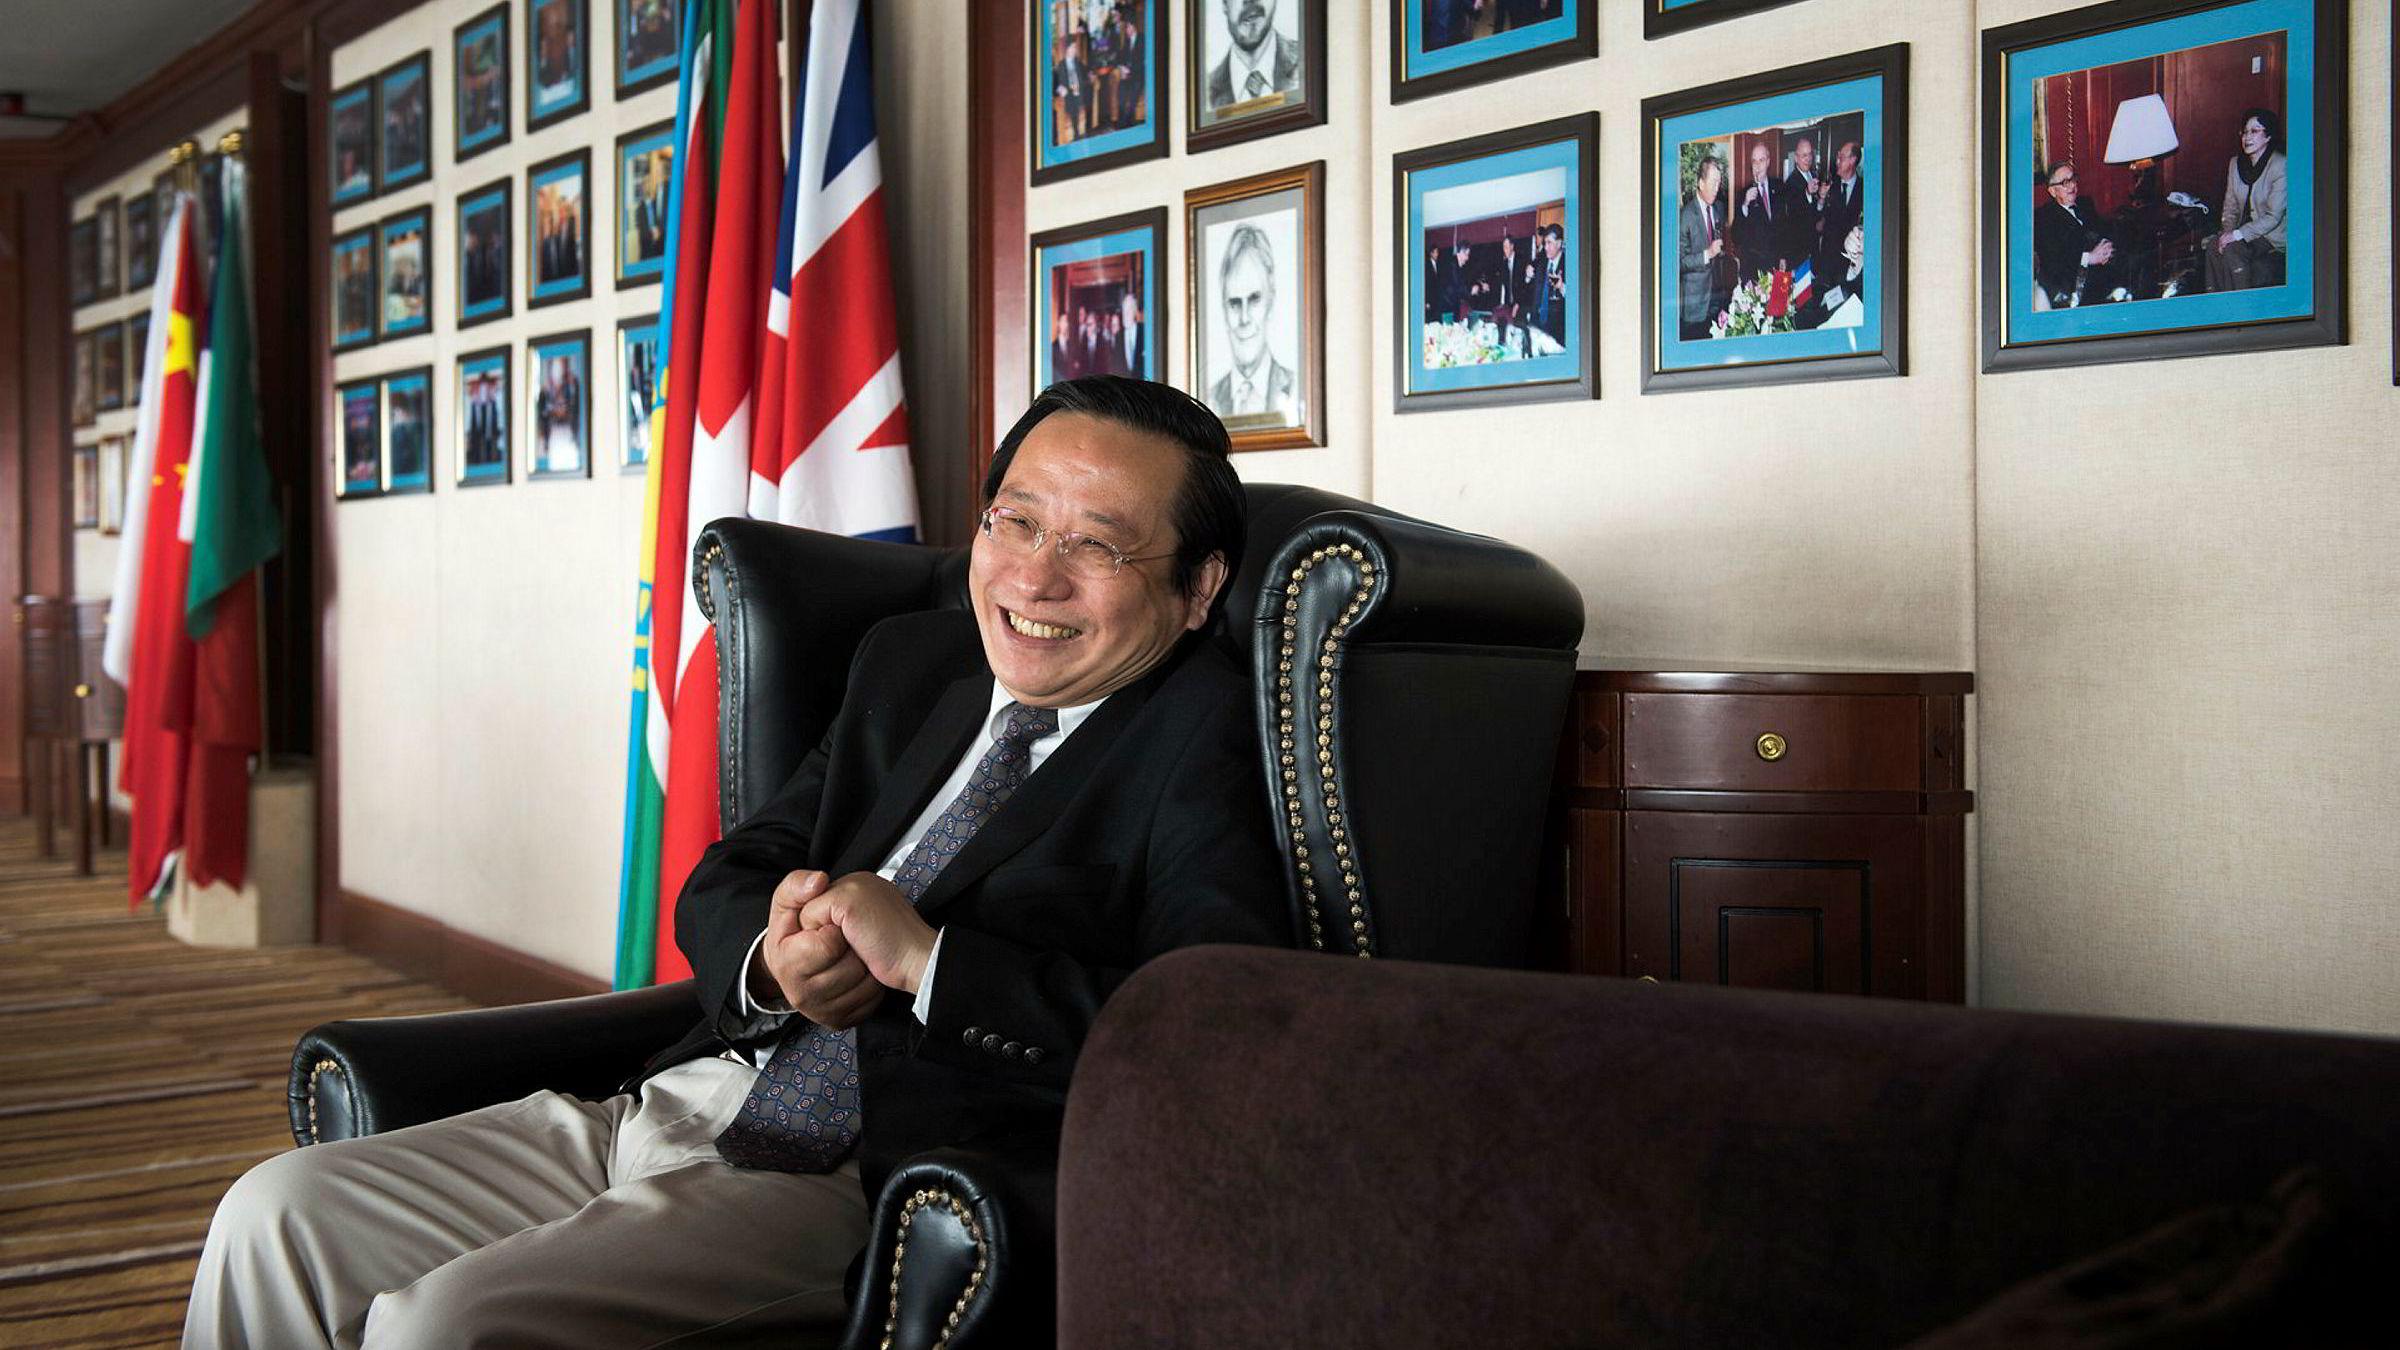 Victor Gao tok initiativ til å få Norge med i den Kina-ledede utviklingsbanken Asian Infrastructure Investment Bank i 2015. I «The Capital Club» snakker han varmt om det normaliserte forholdet.